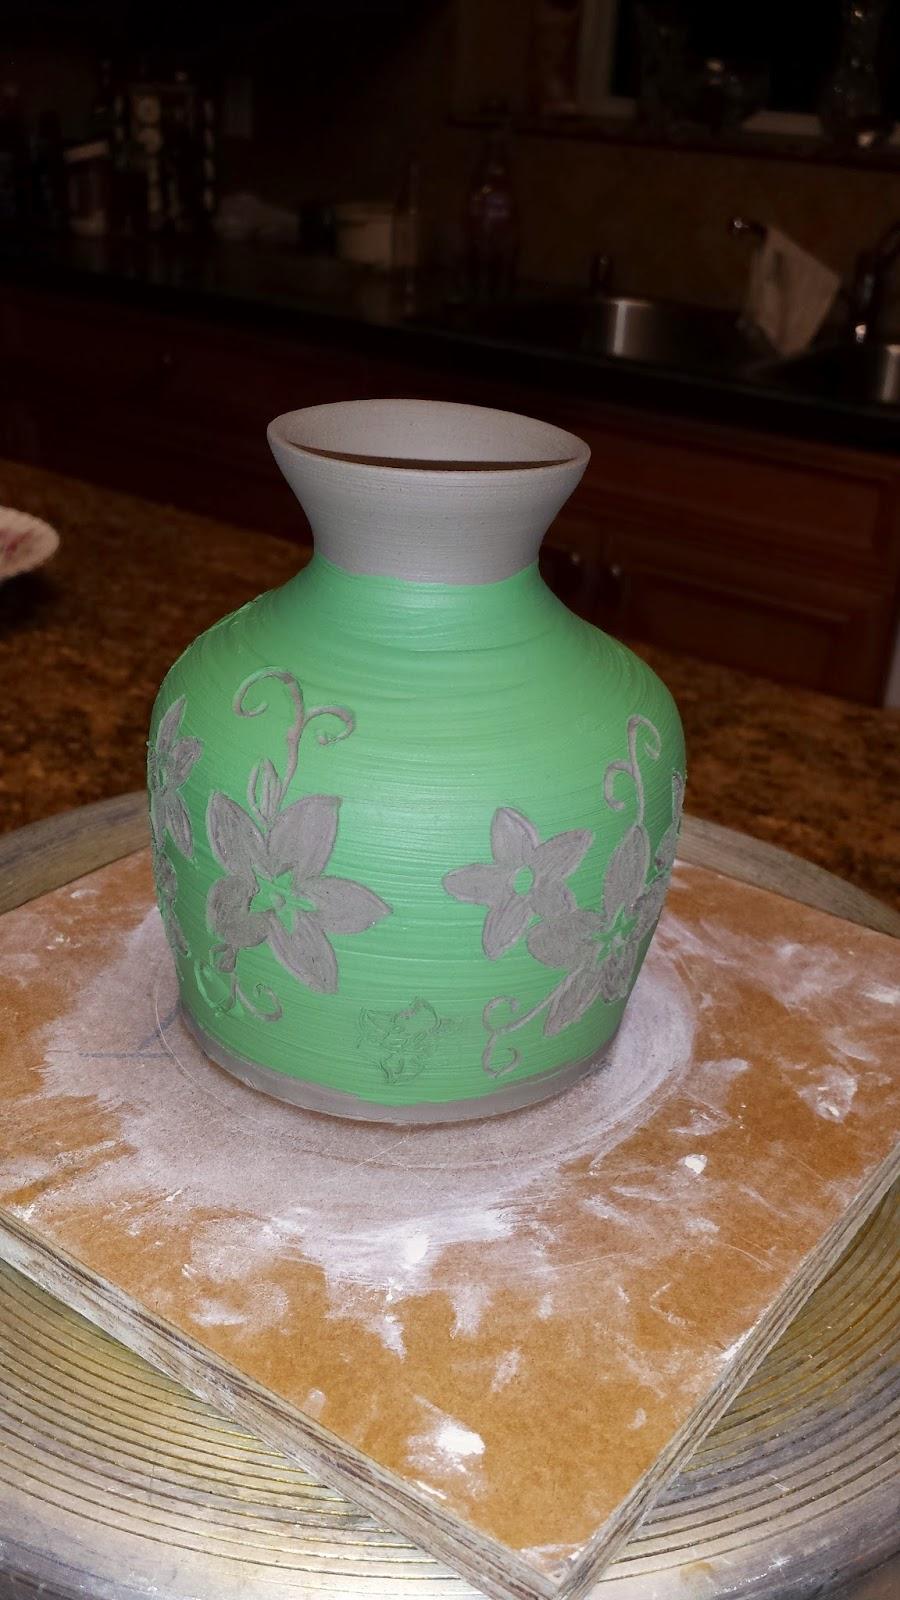 White stoneware vase with sgraffito white flowers on green background, in progress.